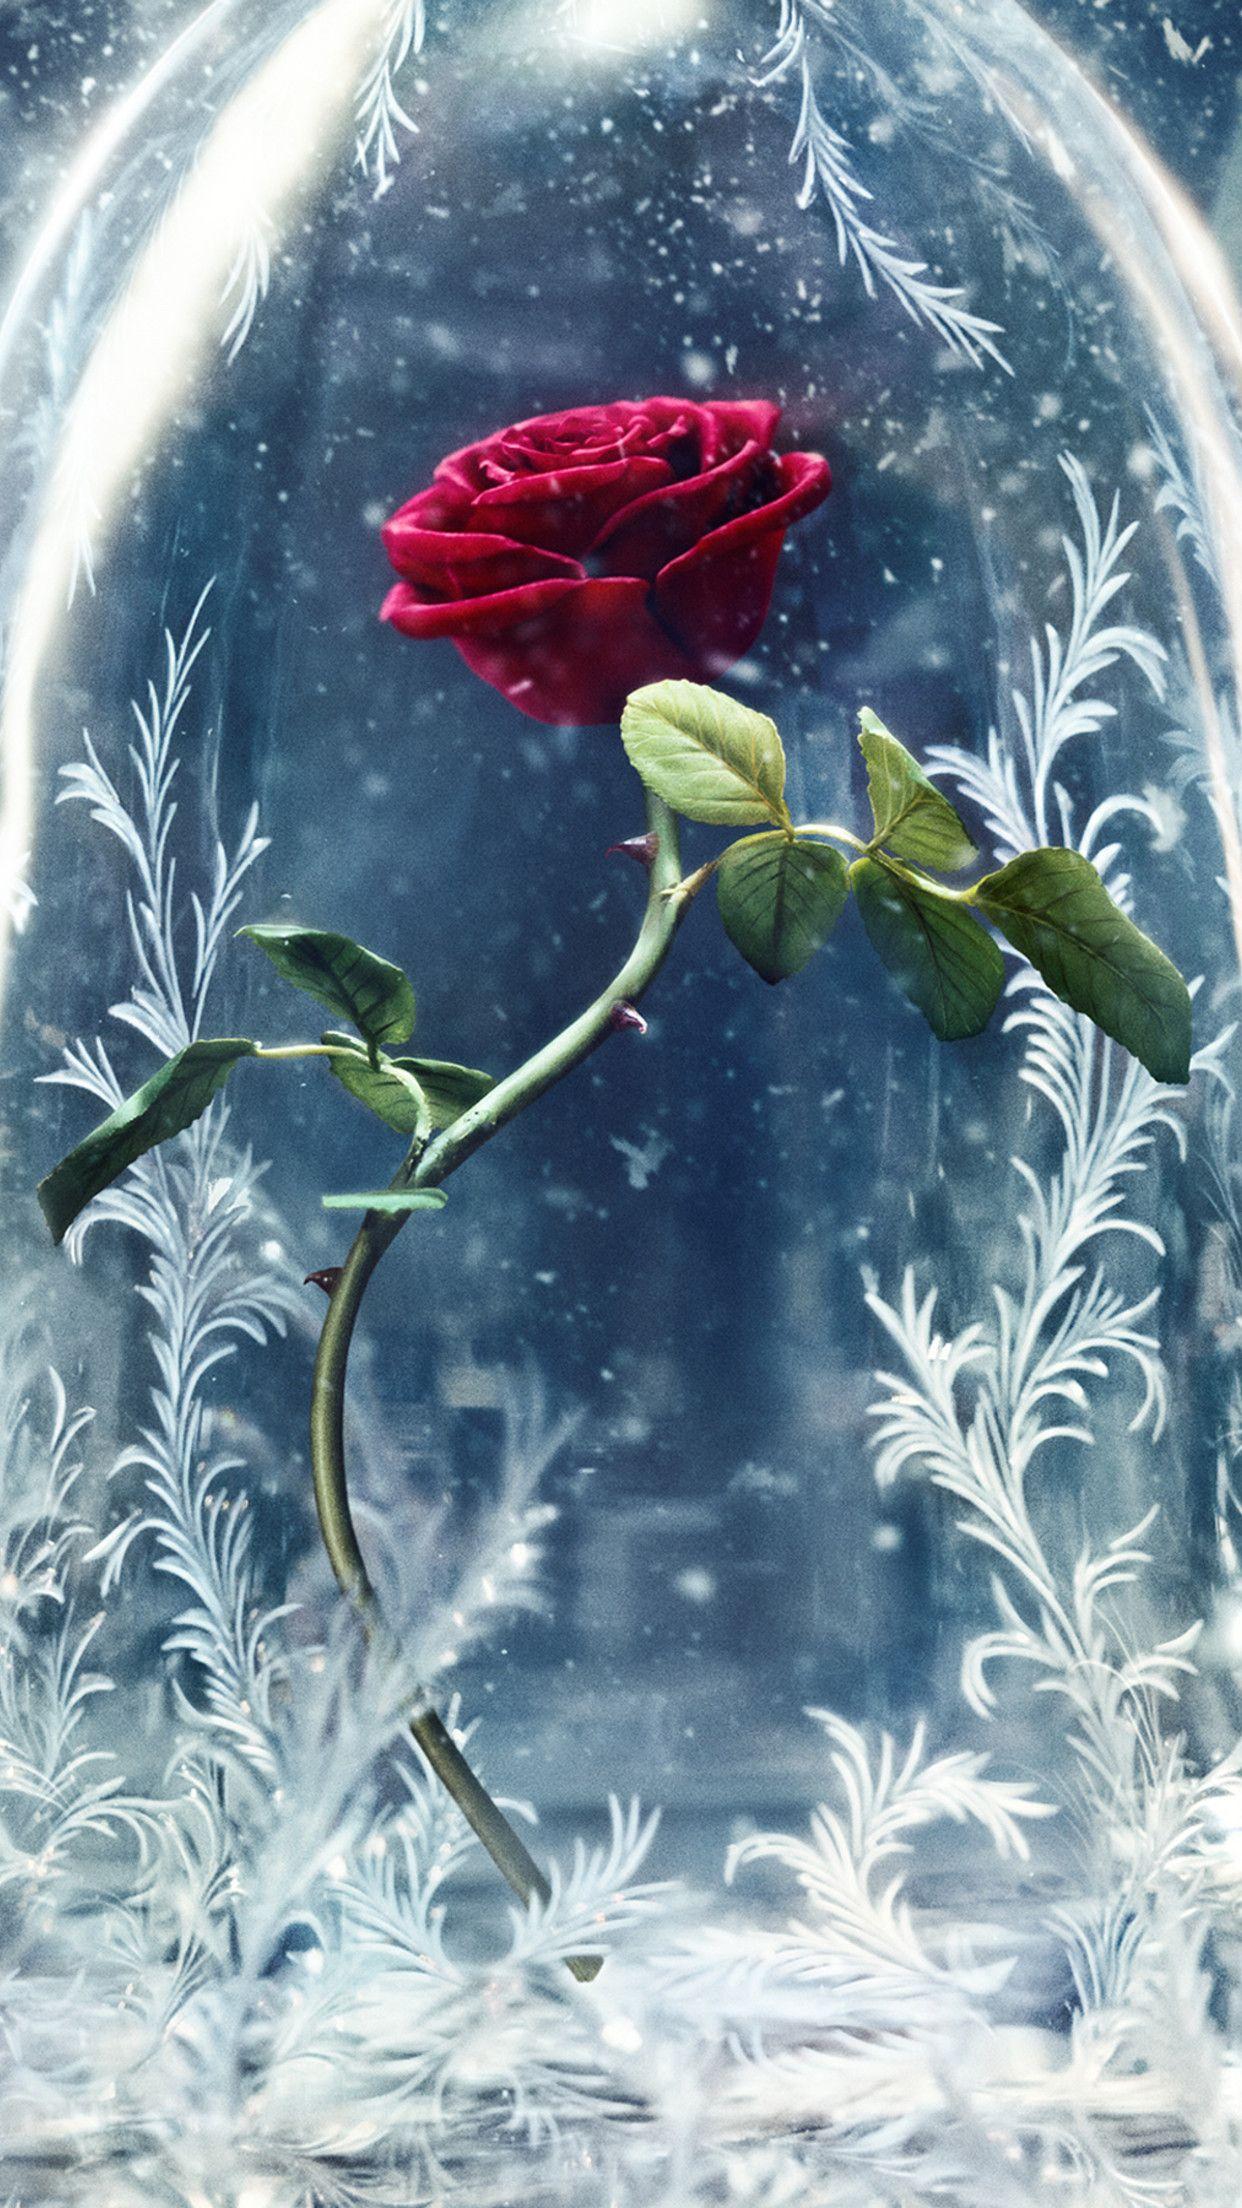 Wonderful Red Rose Protected From The Cold Winter Season Beast Wallpaper Disney Wallpaper Cute Disney Wallpaper